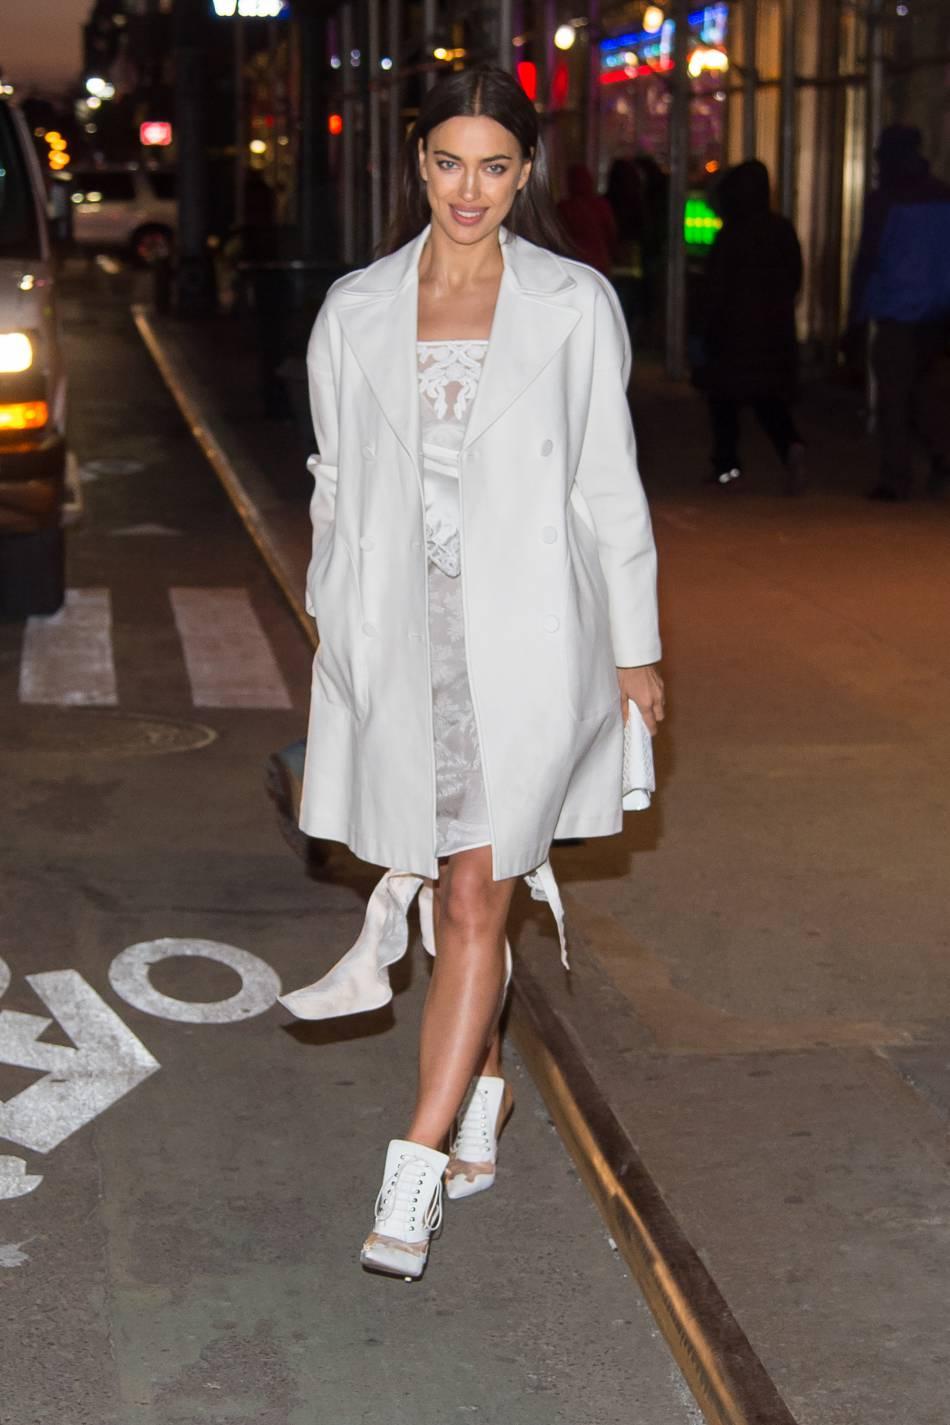 Irina Shayk surprend ses fans avec son changement capillaire.